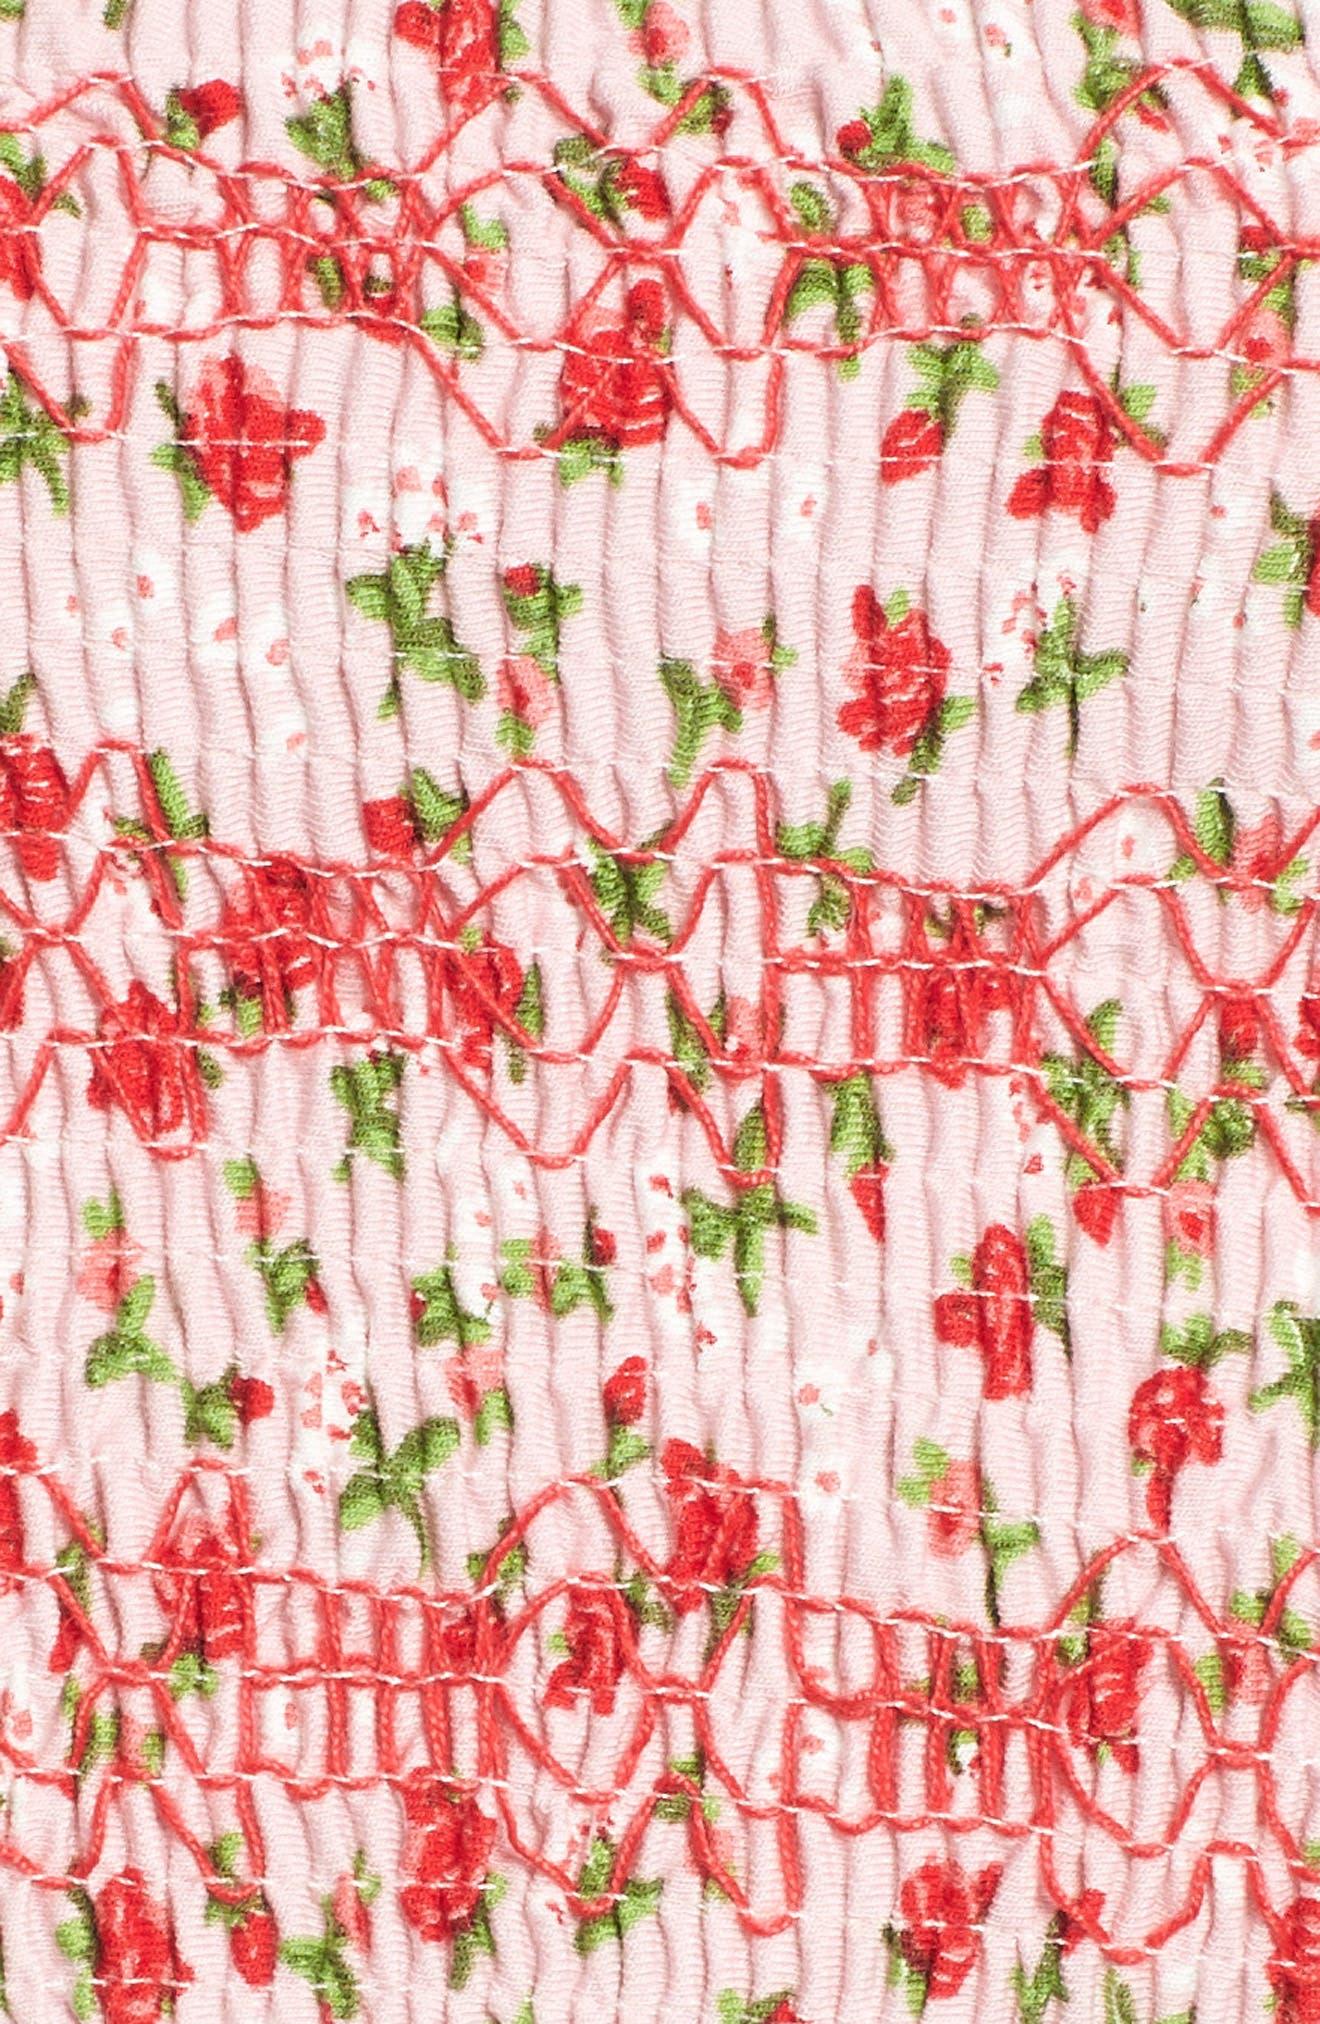 Floral Print Tube Top,                             Alternate thumbnail 5, color,                             Pink Multi